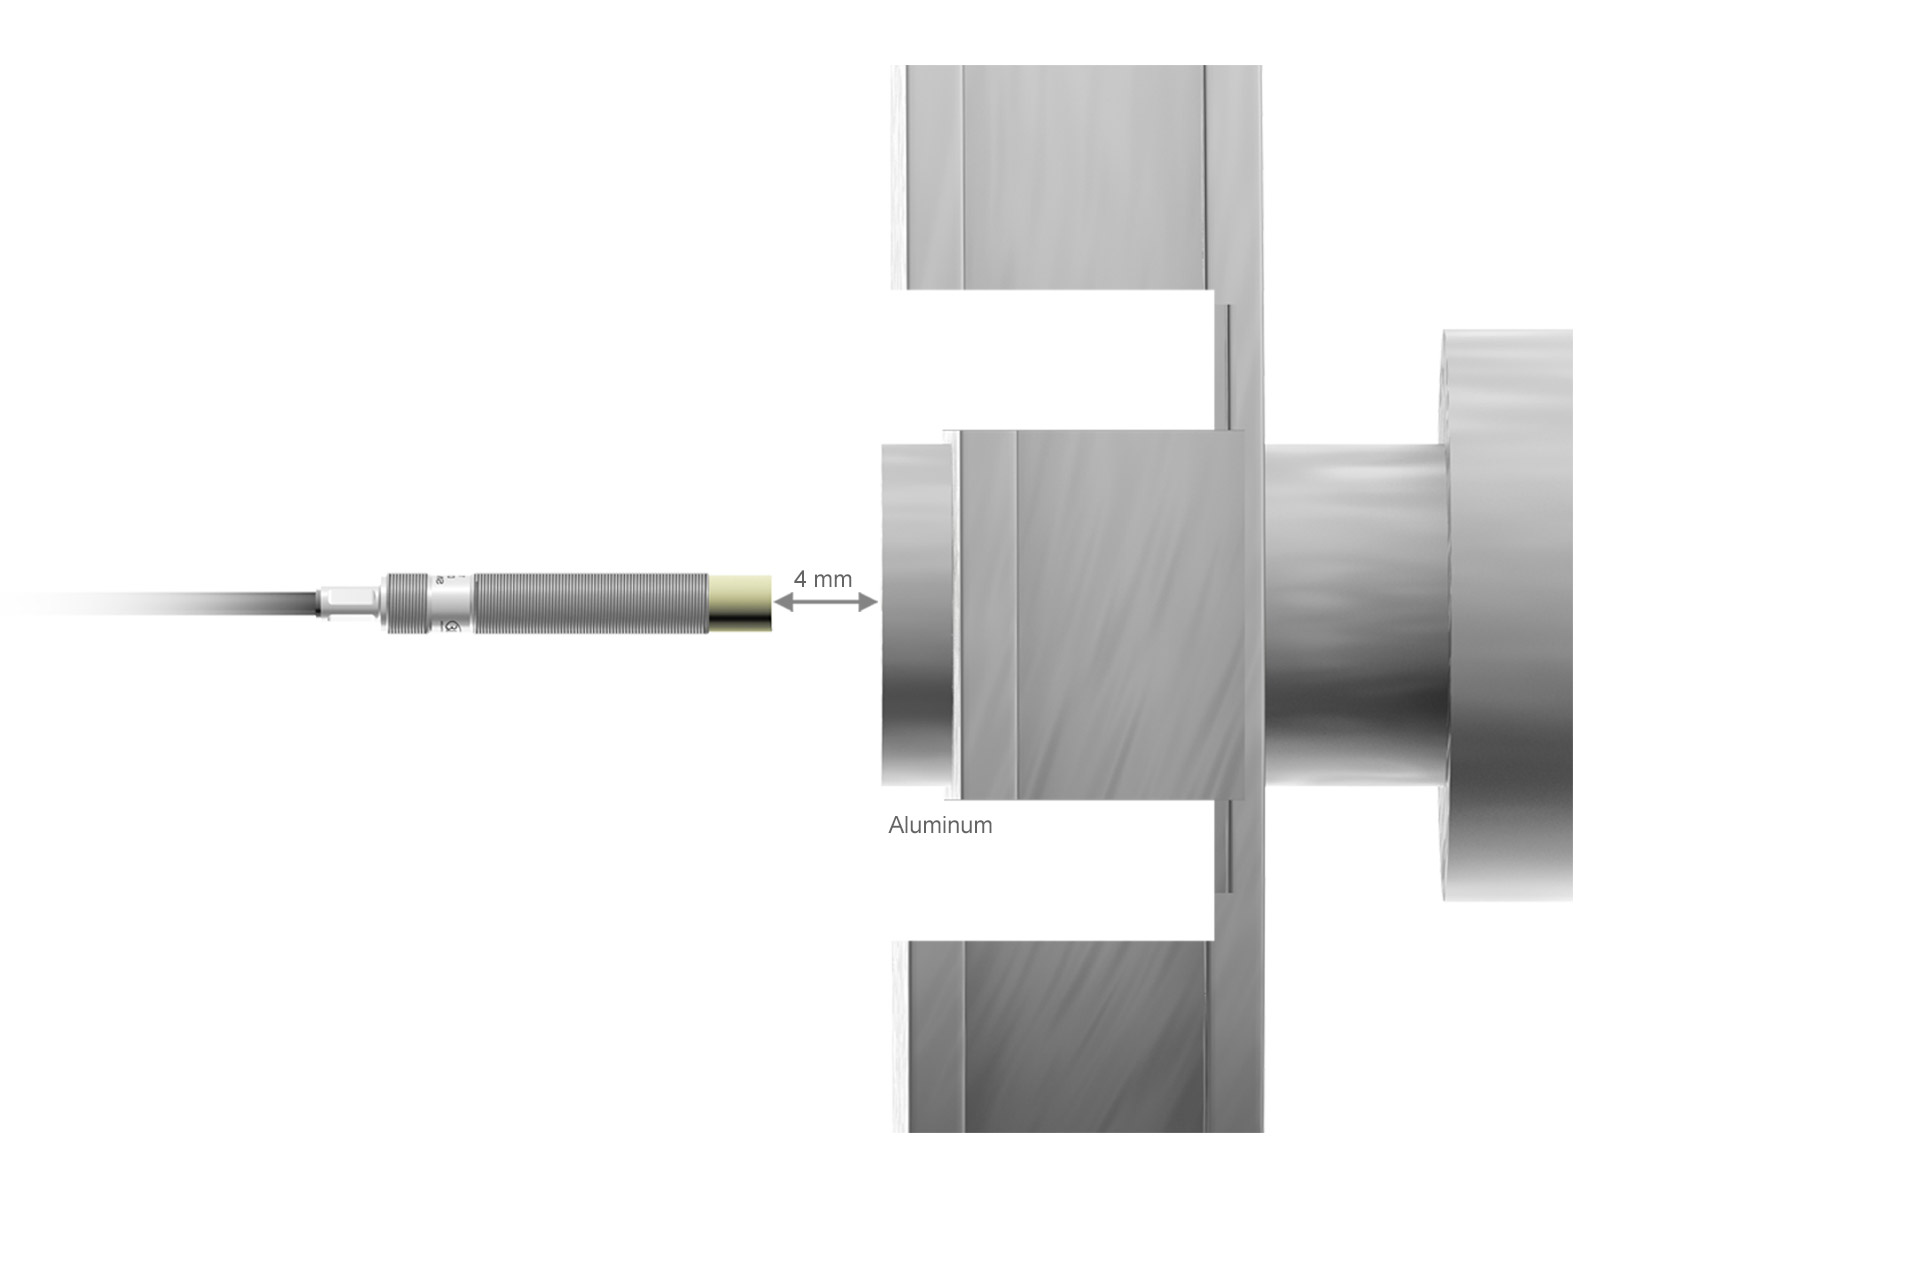 DT3001-U4-A-C3 Wirbelstrom-Wegsensor